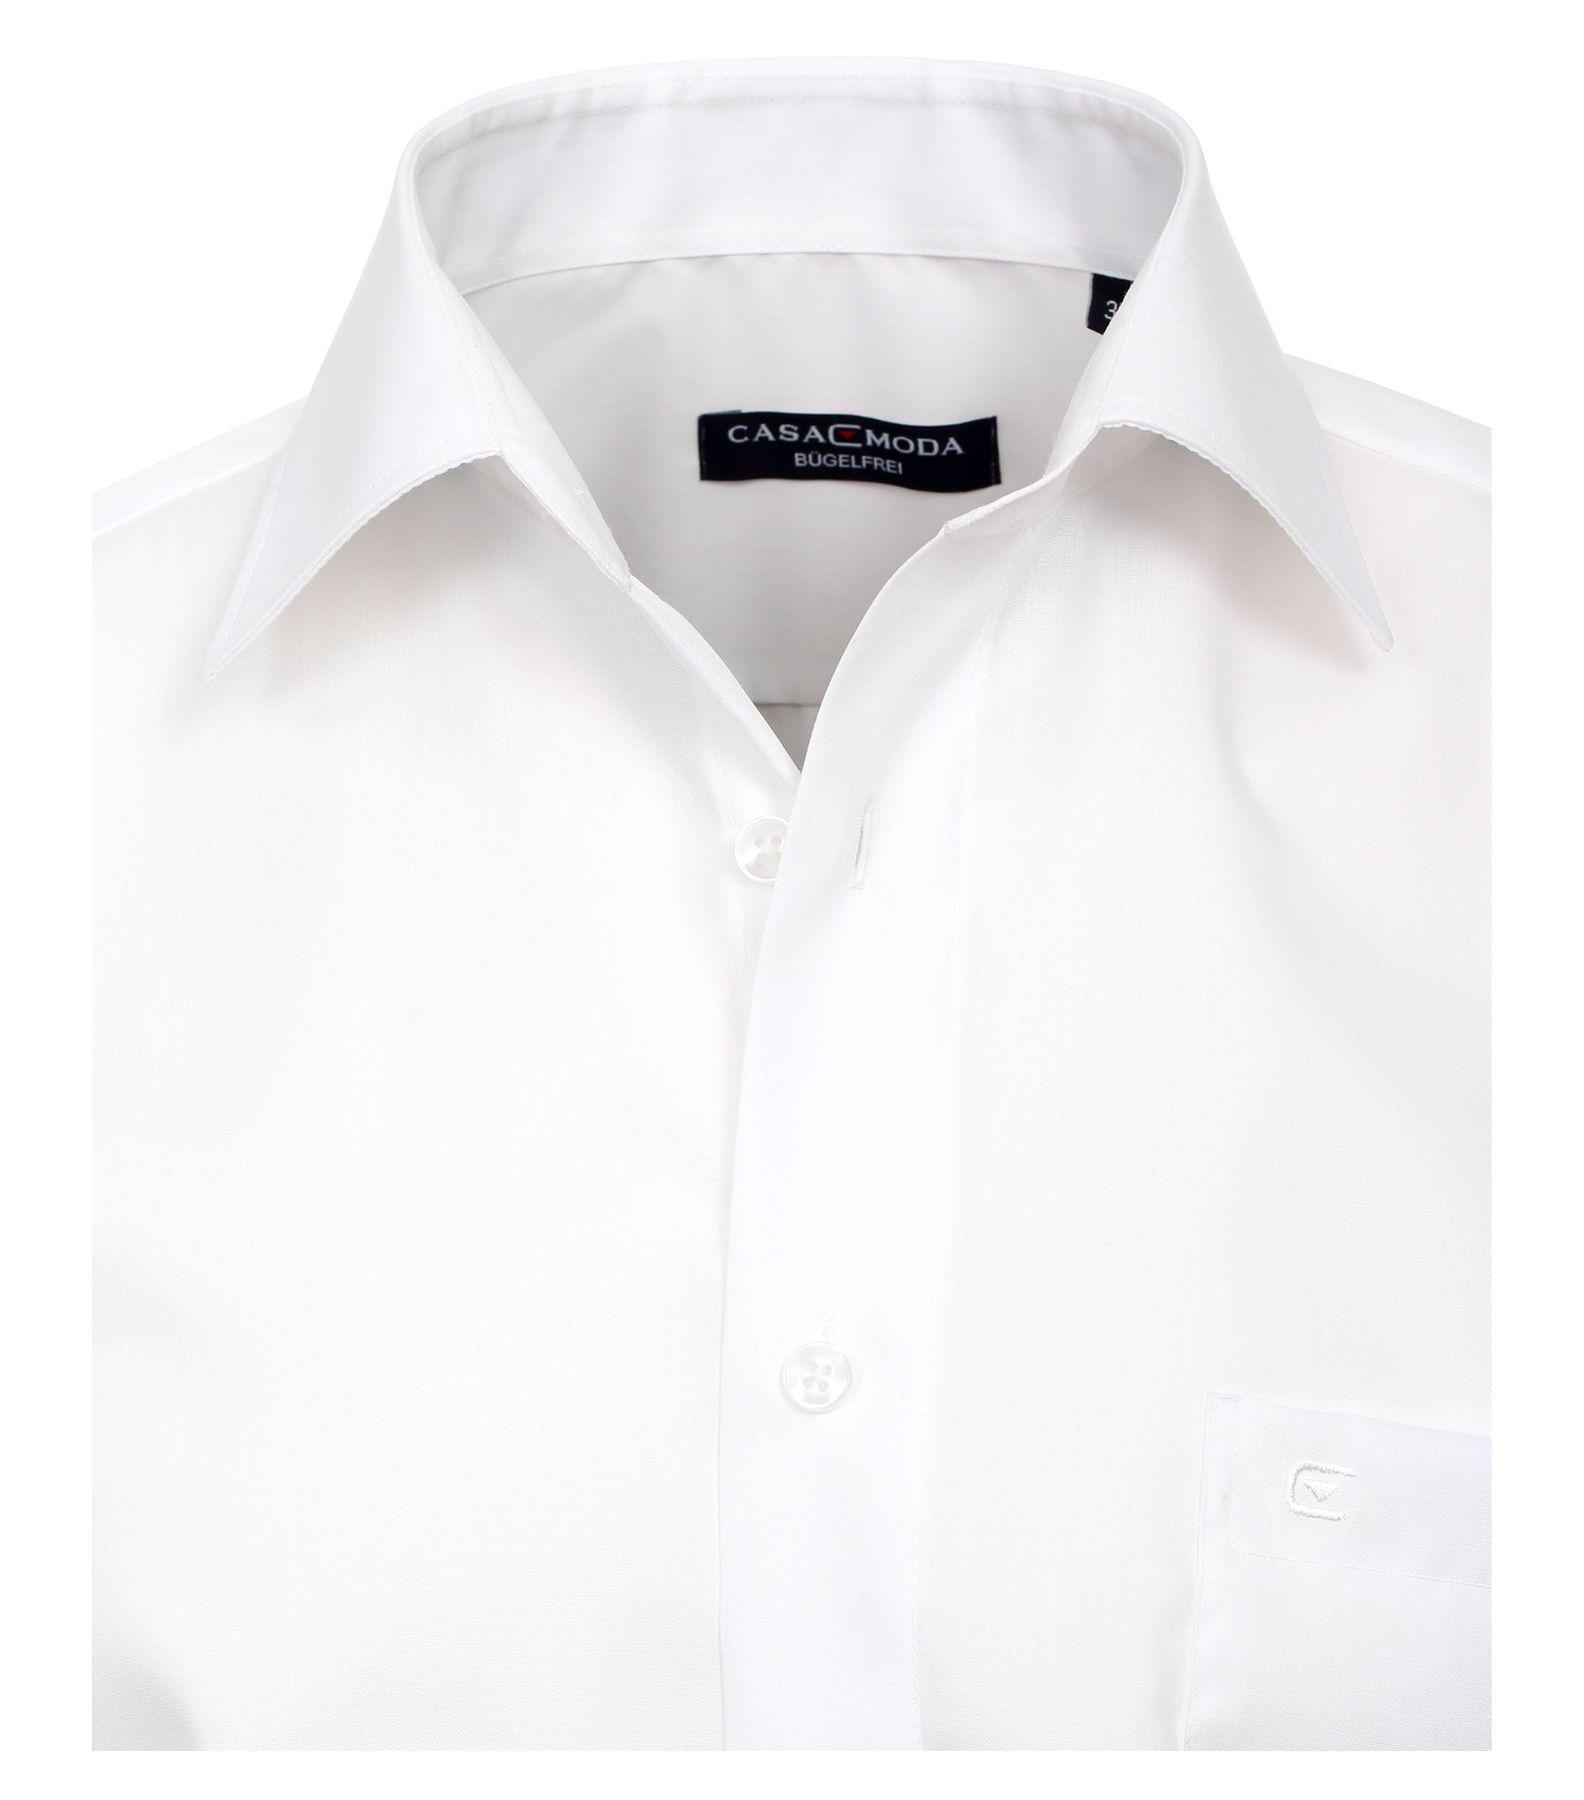 Casa Moda - Comfort Fit - Bügelfreies Herren Business Langarm Hemd verschiedene Farben (006060A) – Bild 11